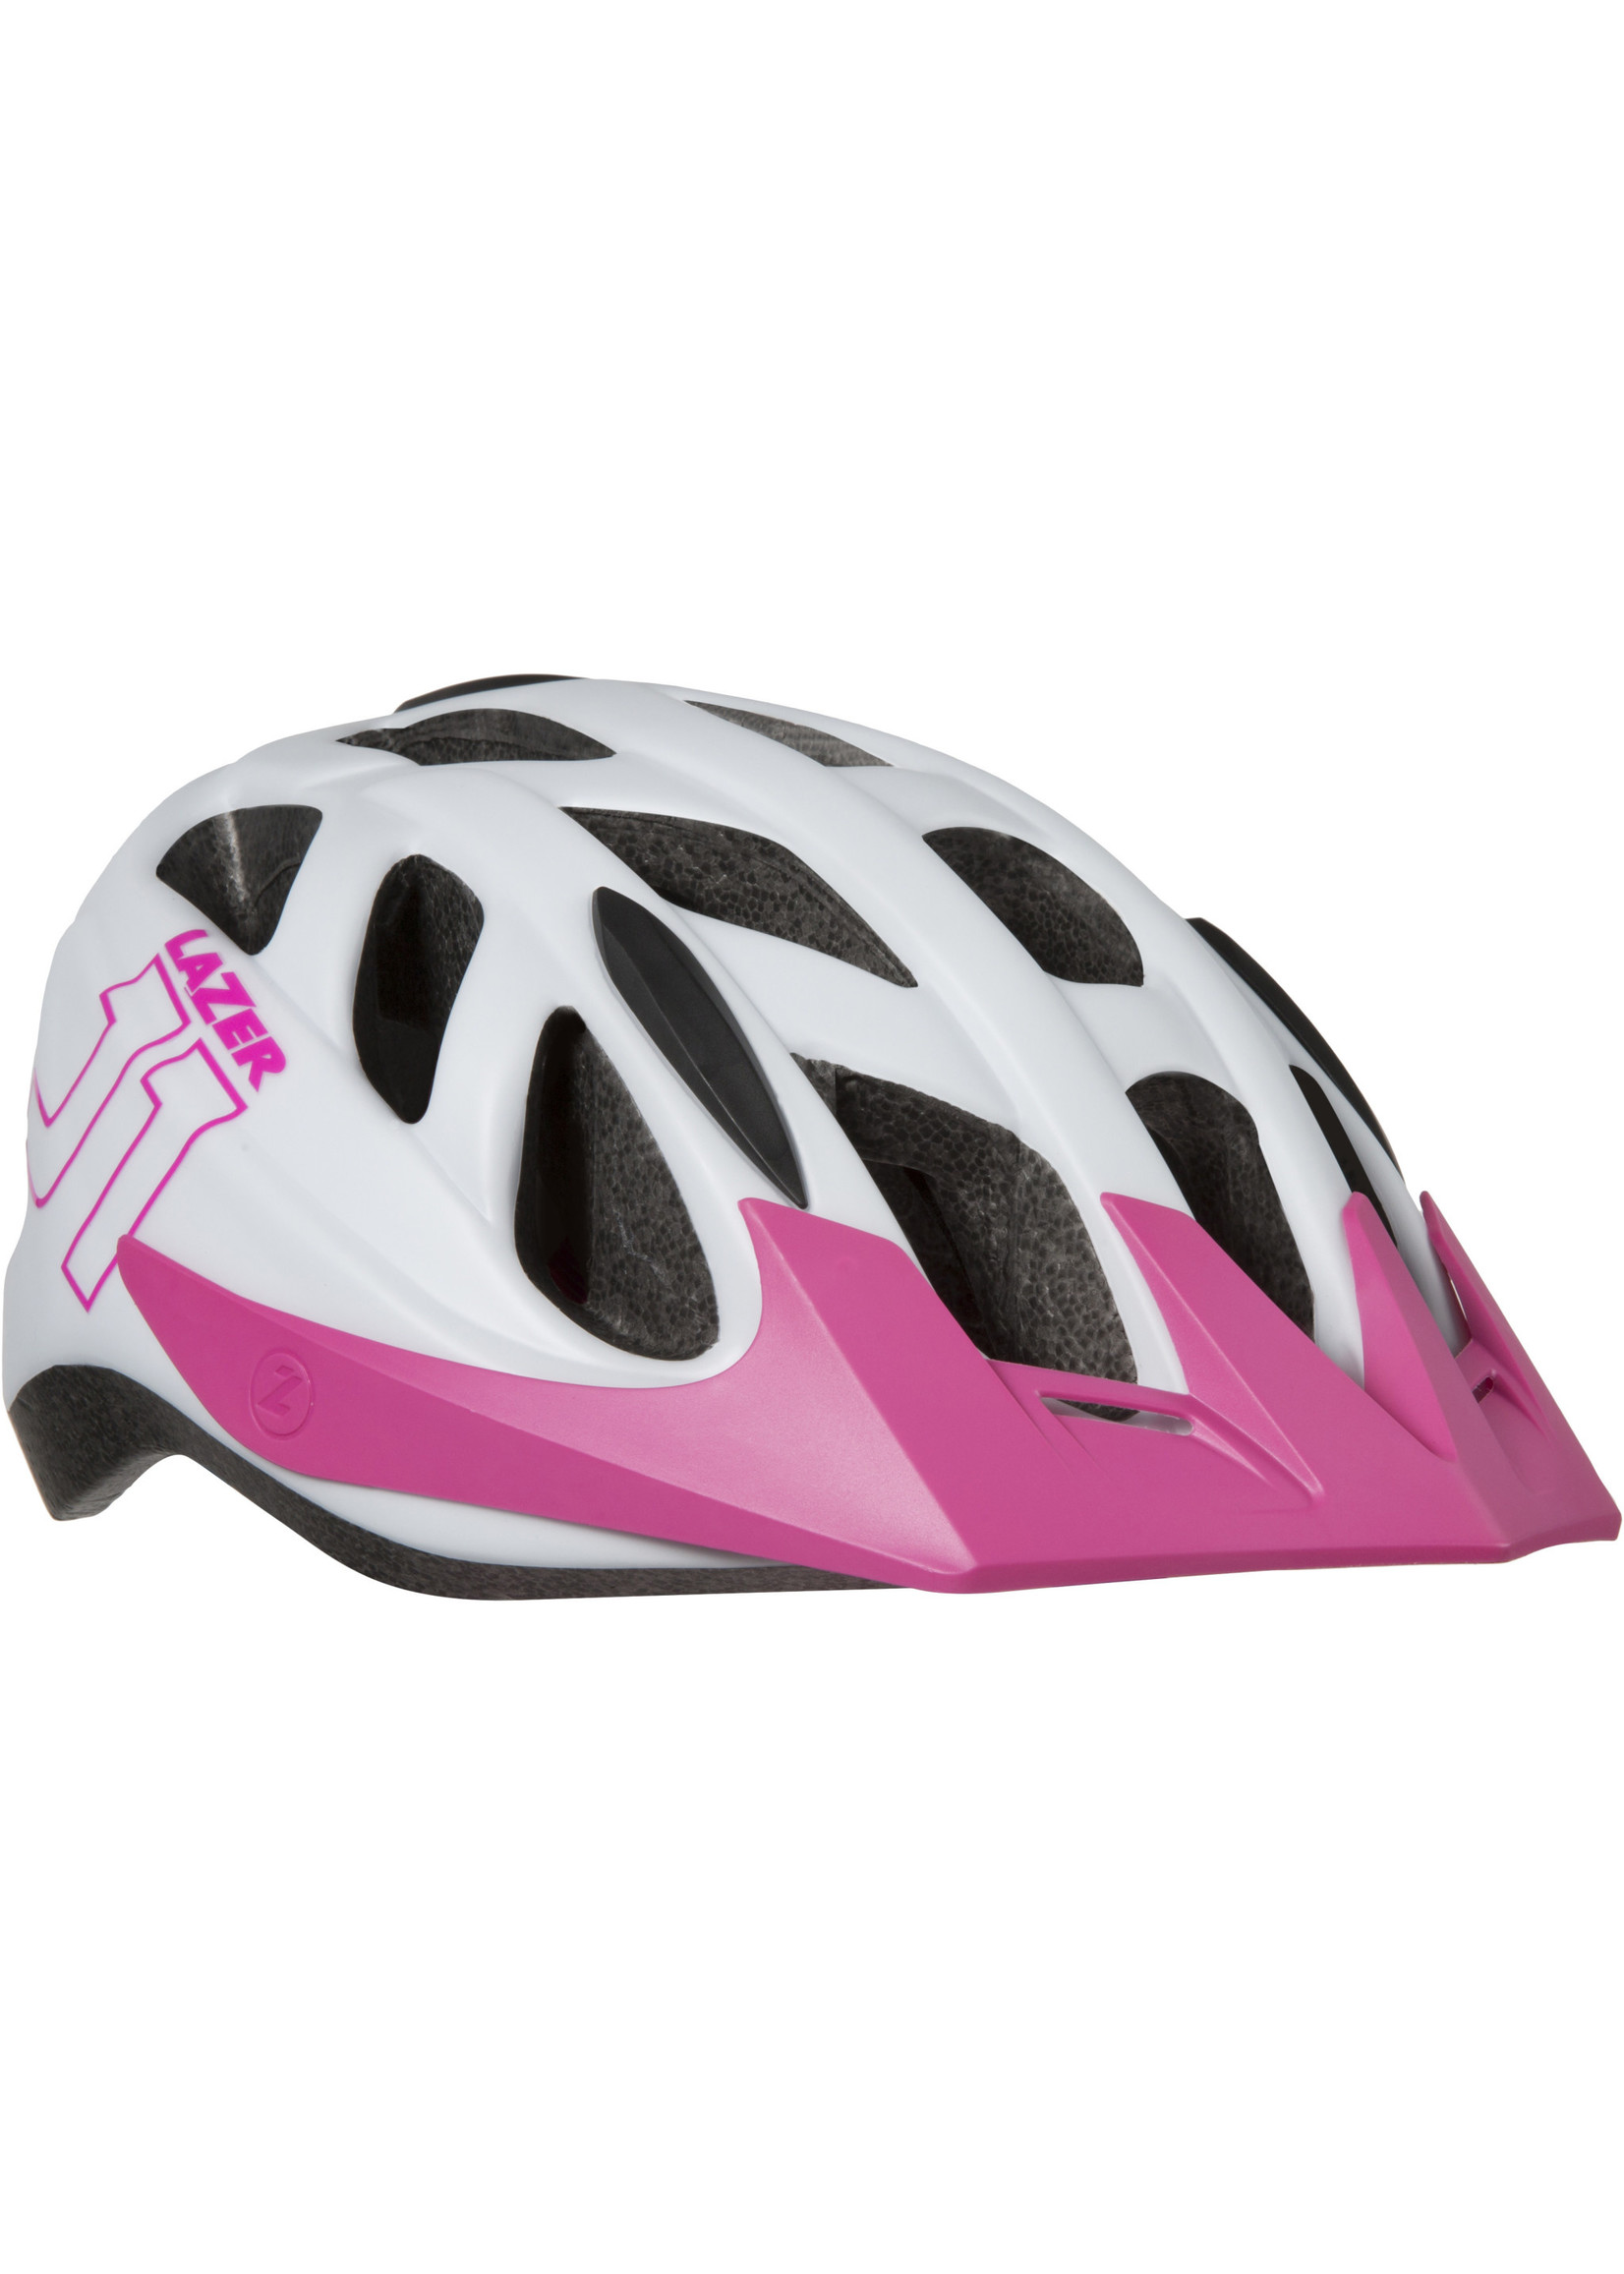 Lazer J1 Helmet, White/Pink, Uni-Youth